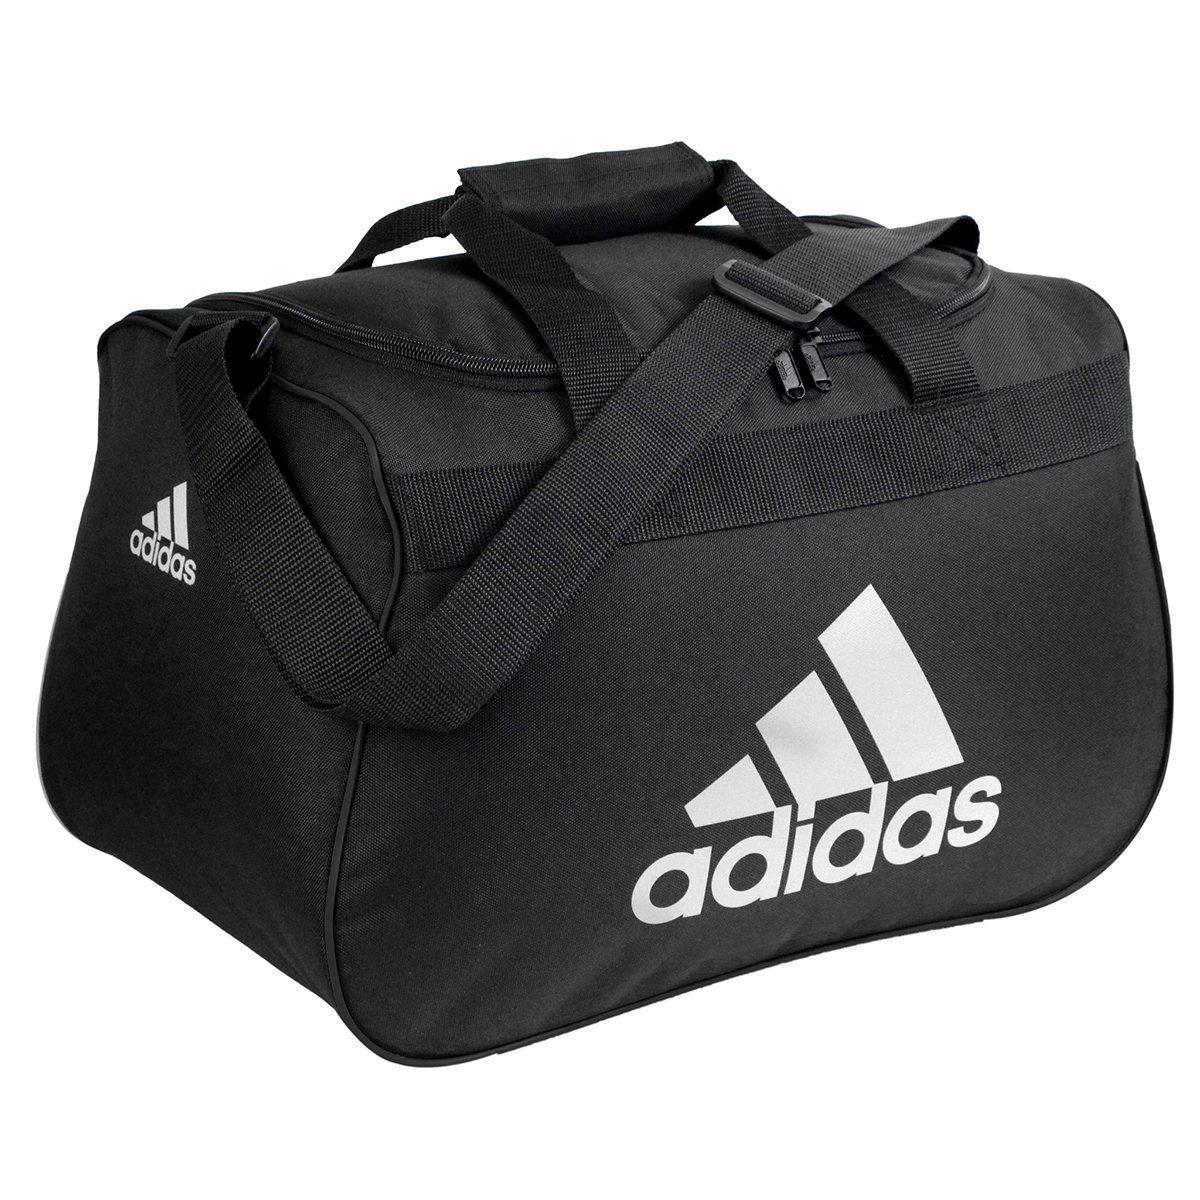 Adidas Diablo Small Duffel Bag - Black White  Amazon.co.uk  Sports    Outdoors ec69d1f8d6